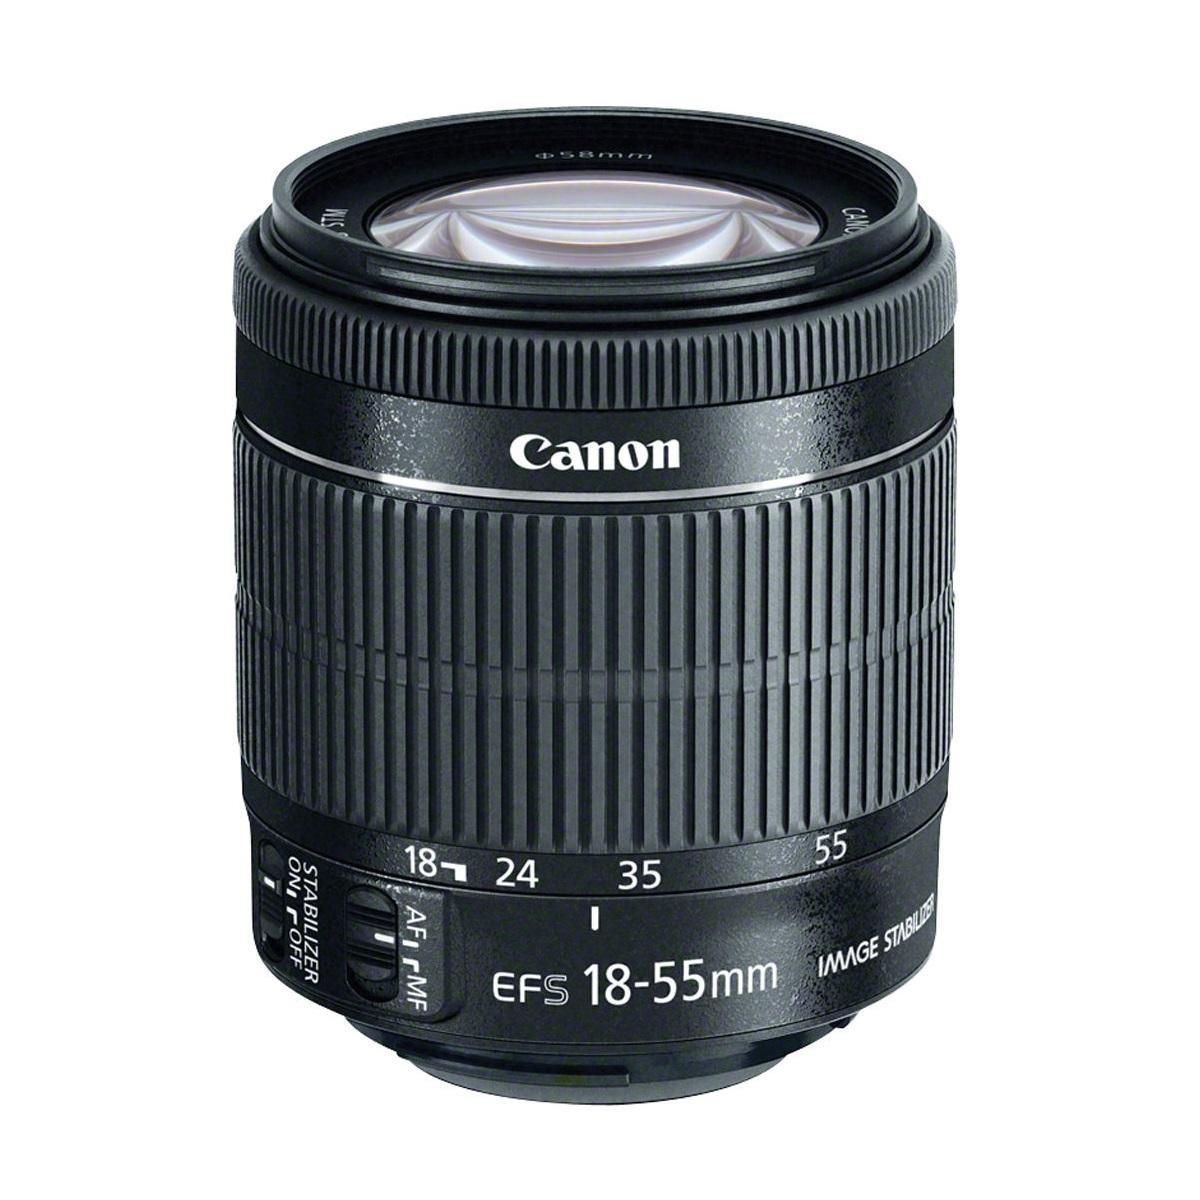 لنز دوربین کانن EF-S 18-55mm F/3.5-5.6 IS II | Canon EF-S 18-55mm F/3.5-5.6 IS II Lens